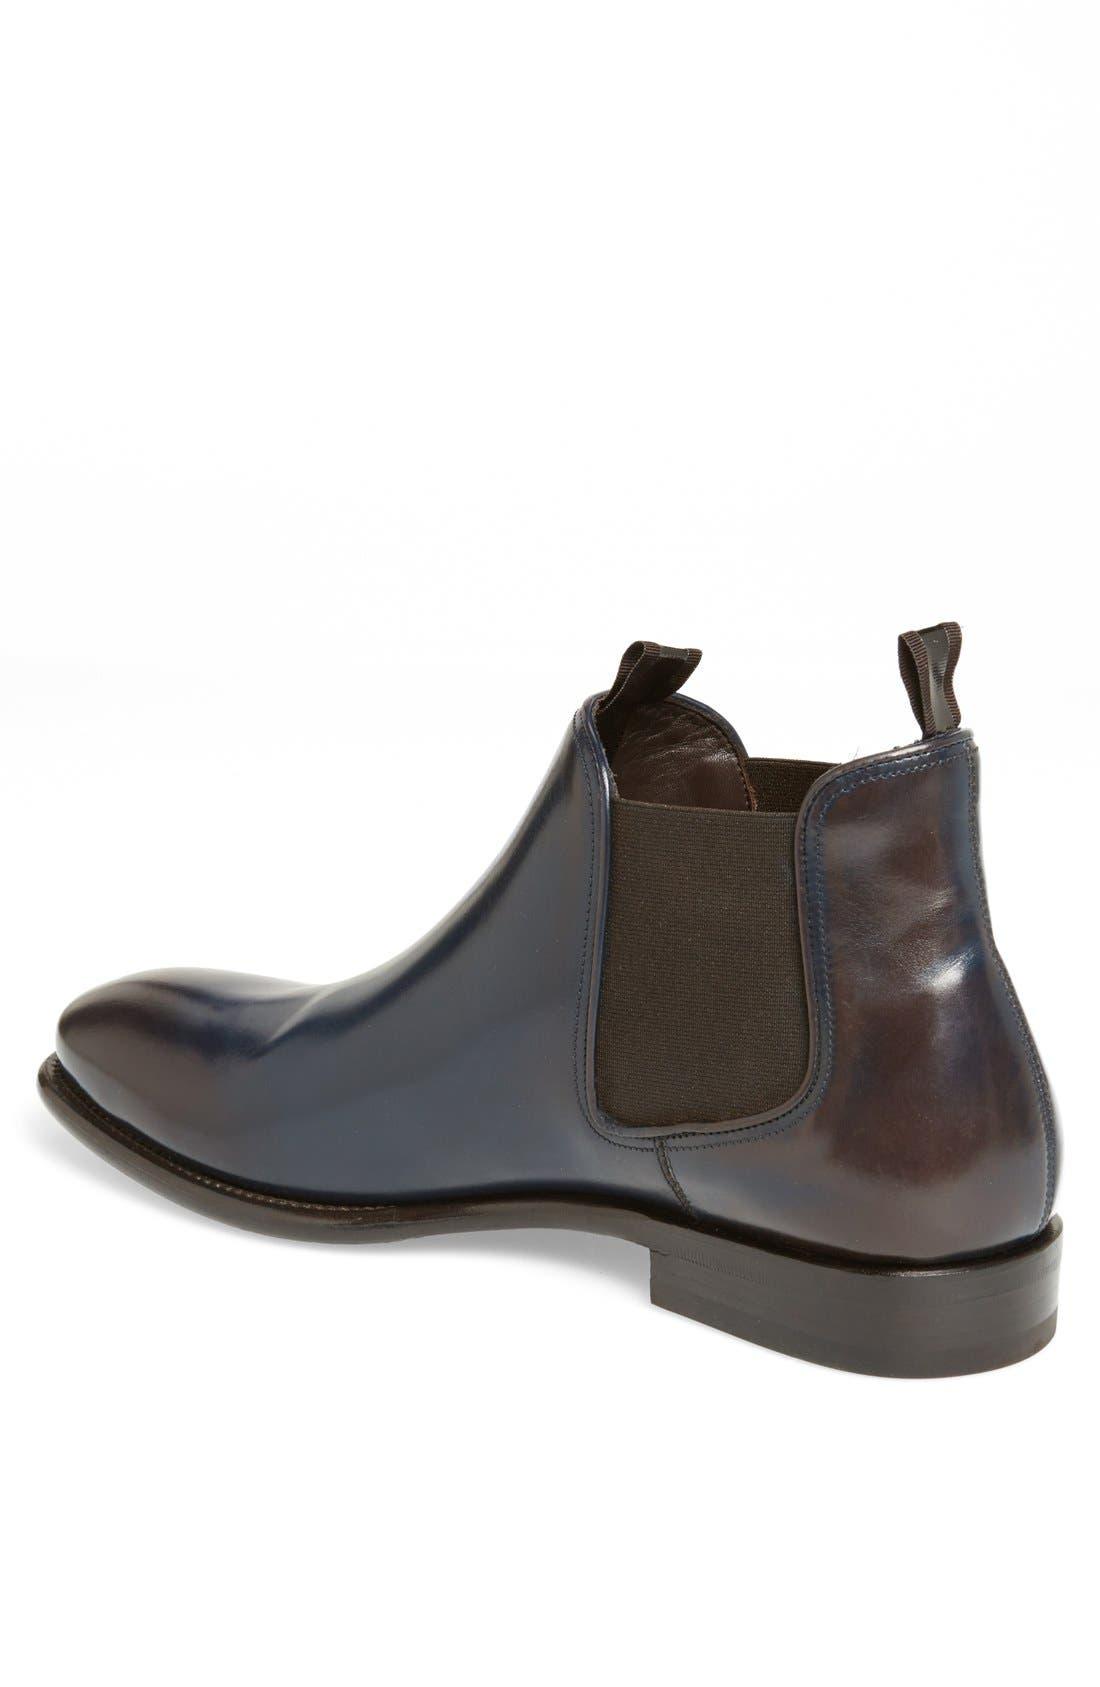 'Santo' Chelsea Boot,                             Alternate thumbnail 2, color,                             Ultramarine Blue